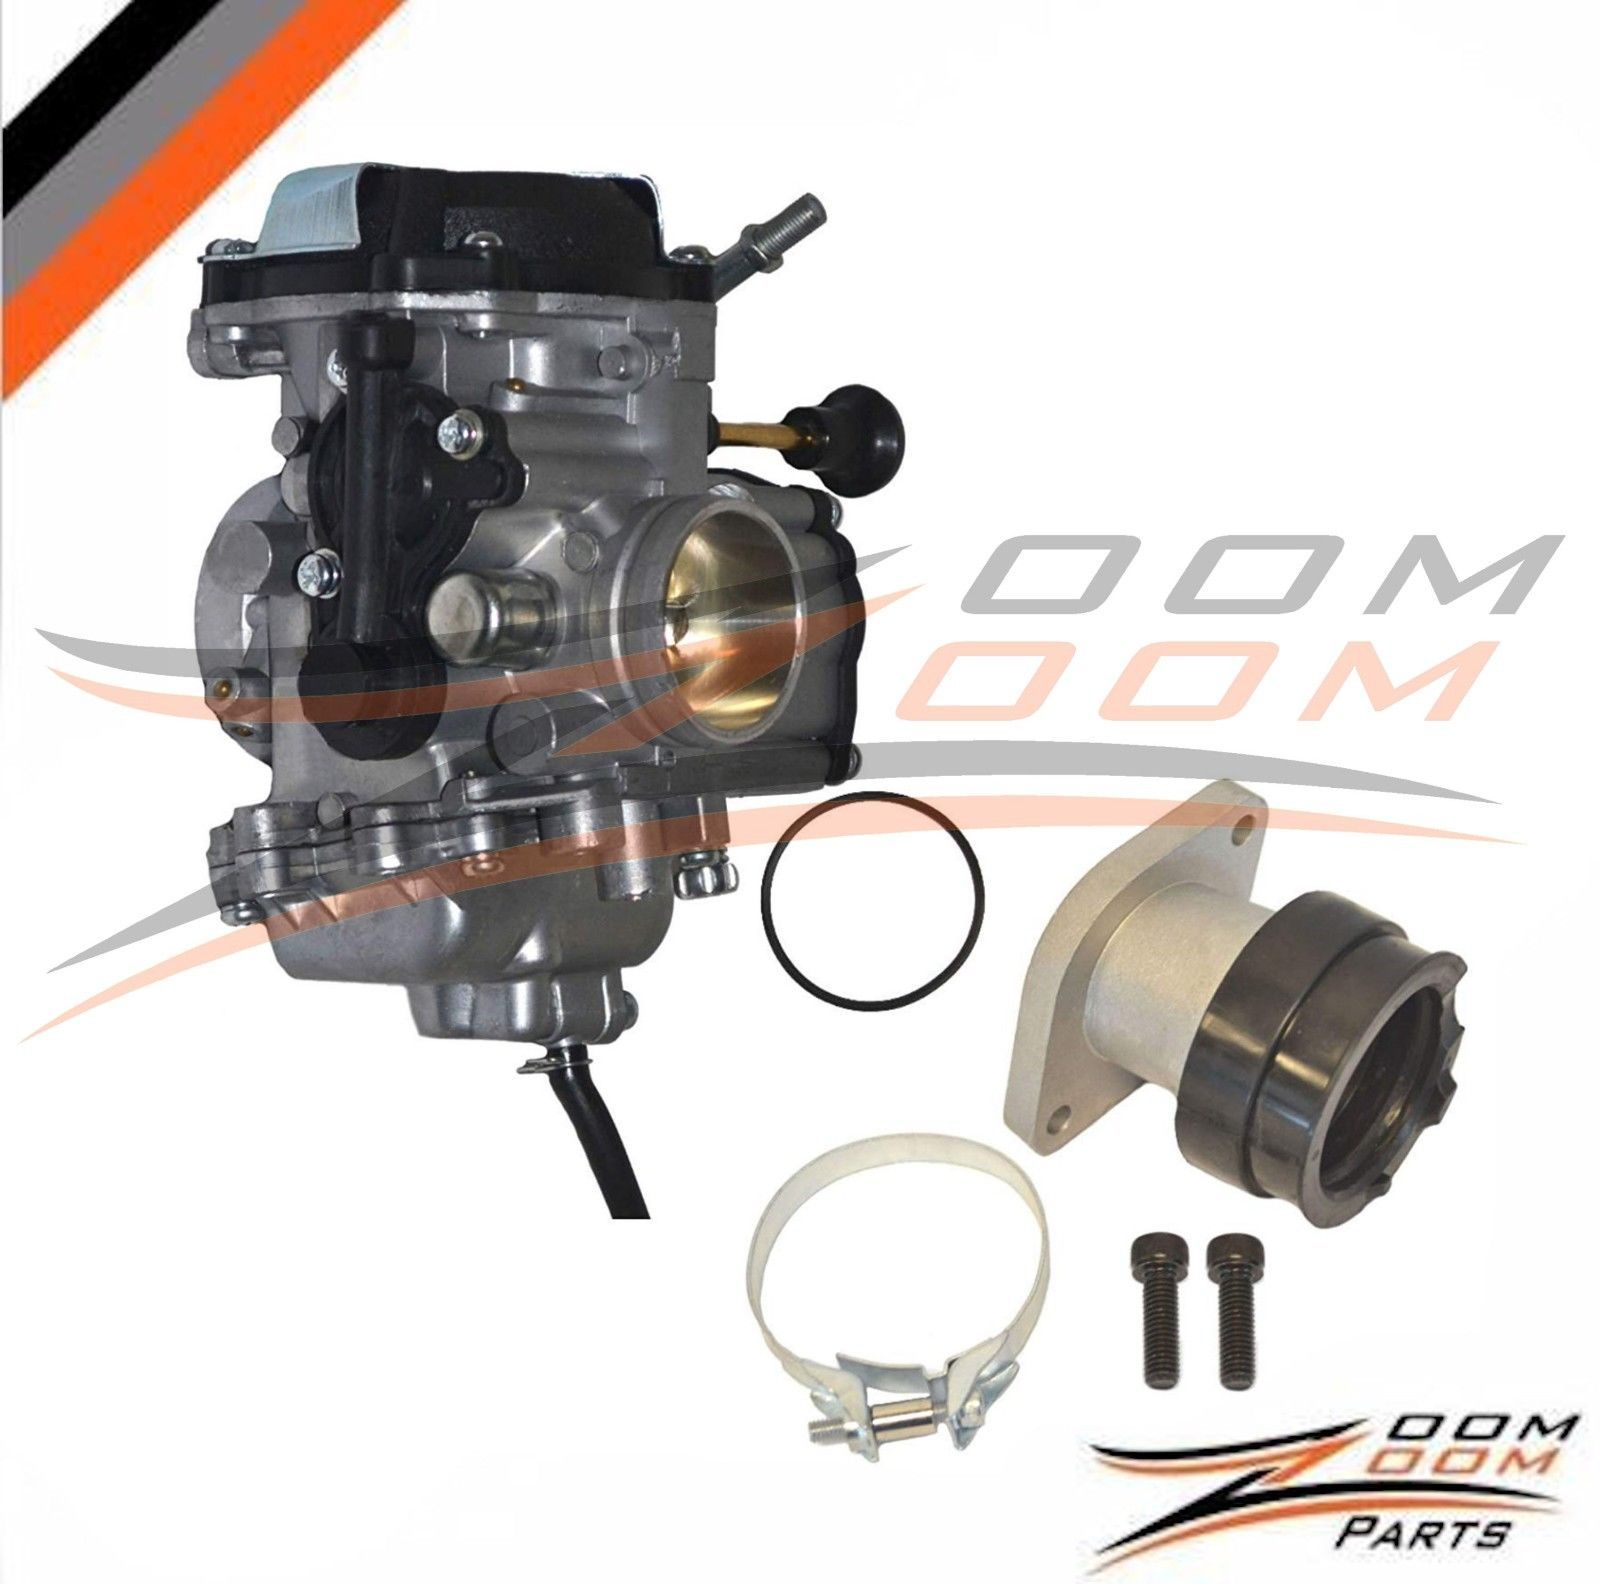 Carburetor Intake For Yamaha Bear Tracker 250 Yfm 250